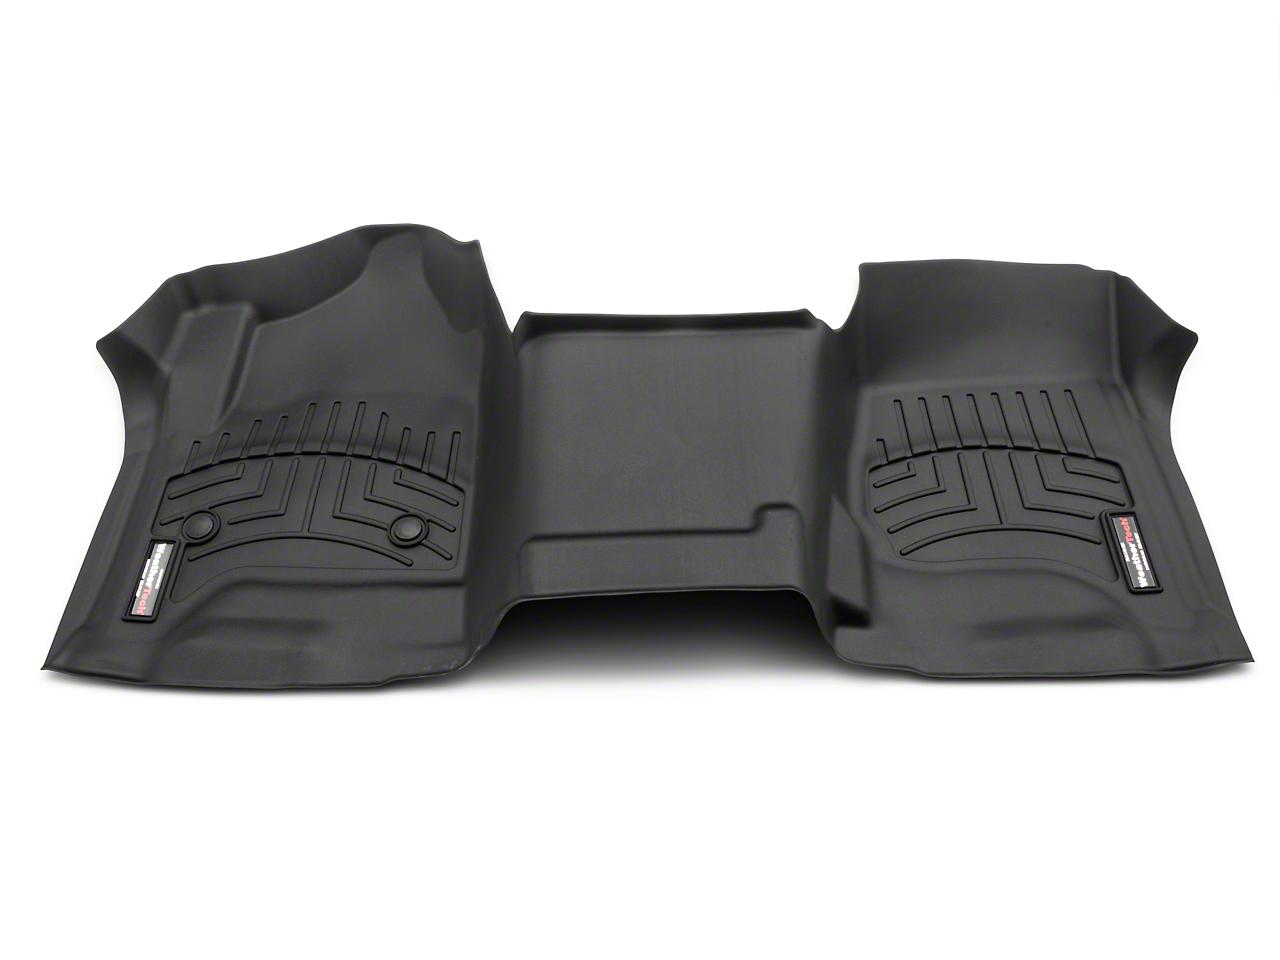 Weathertech DigitalFit Front Floor Liner - Over The Hump - Black (14-18 Silverado 1500 w/o Floor Shifter)